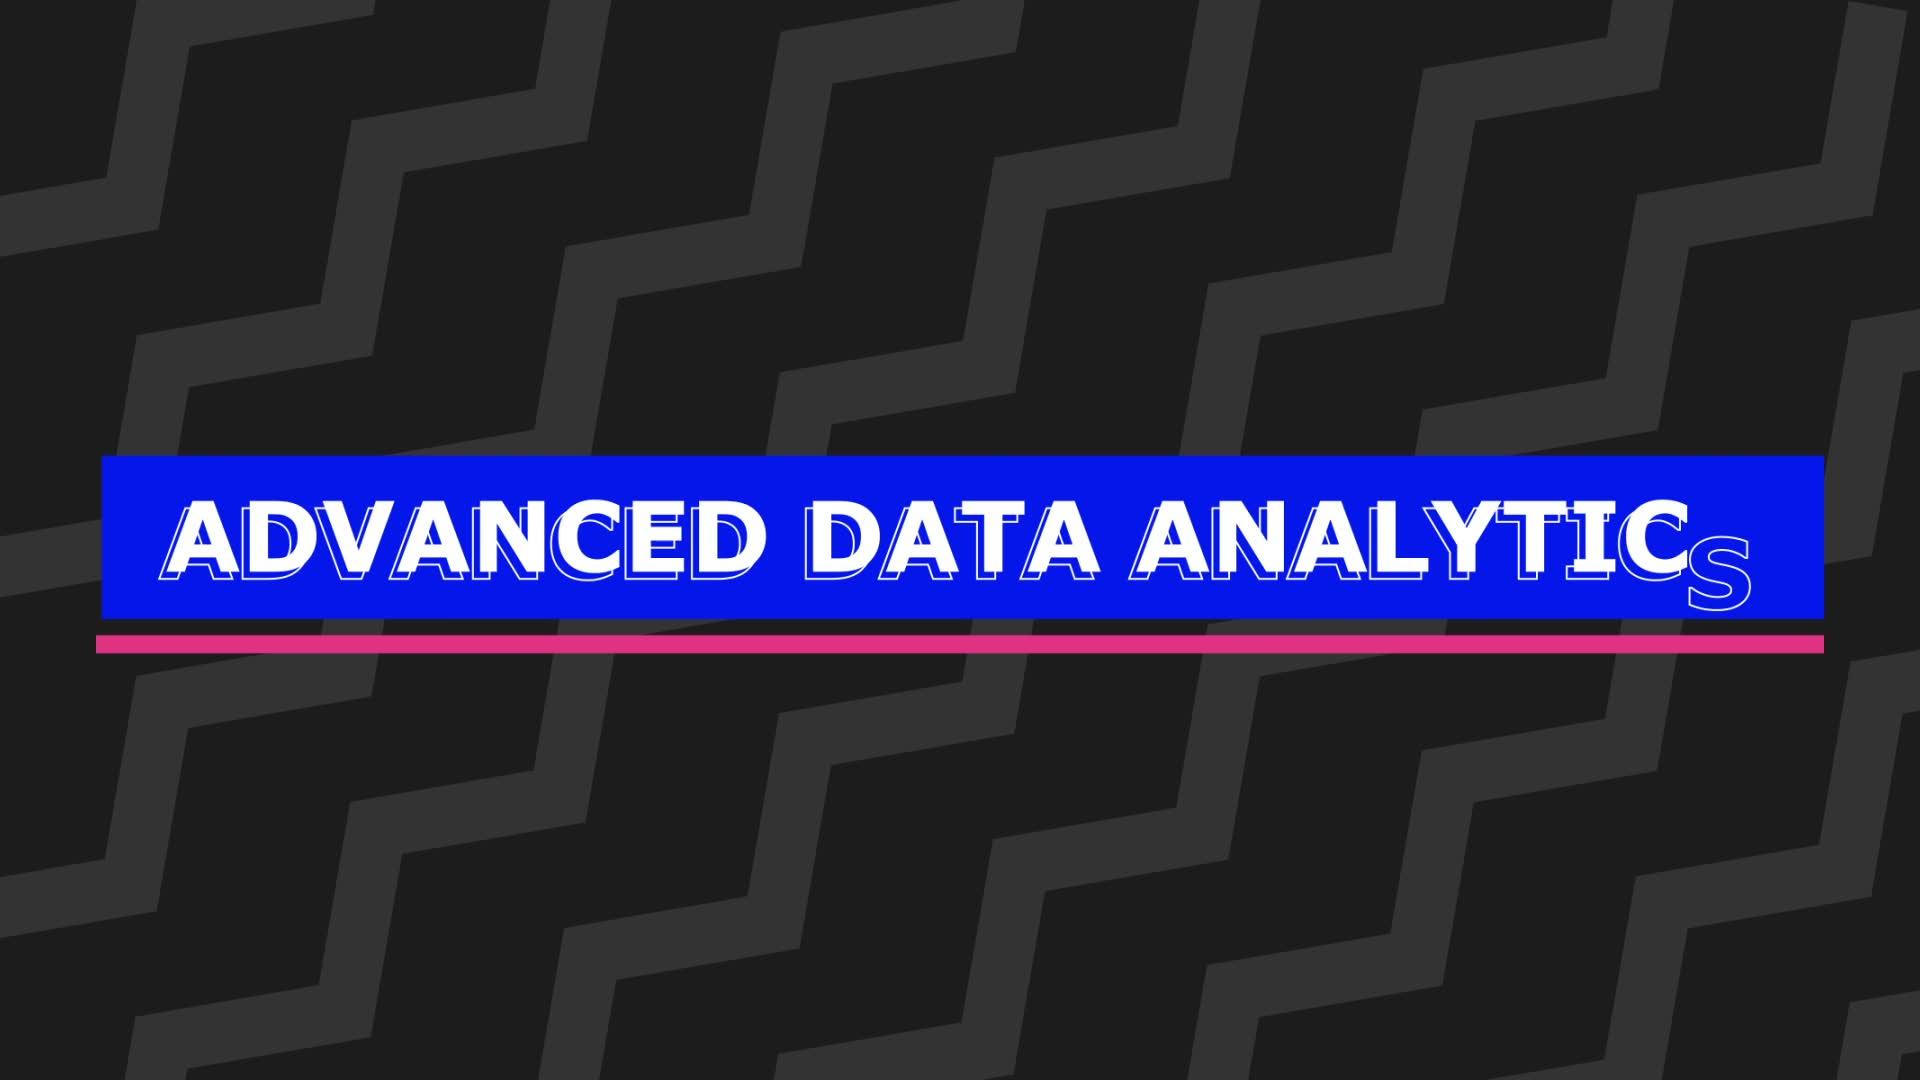 Advanced analytics: A step ahead